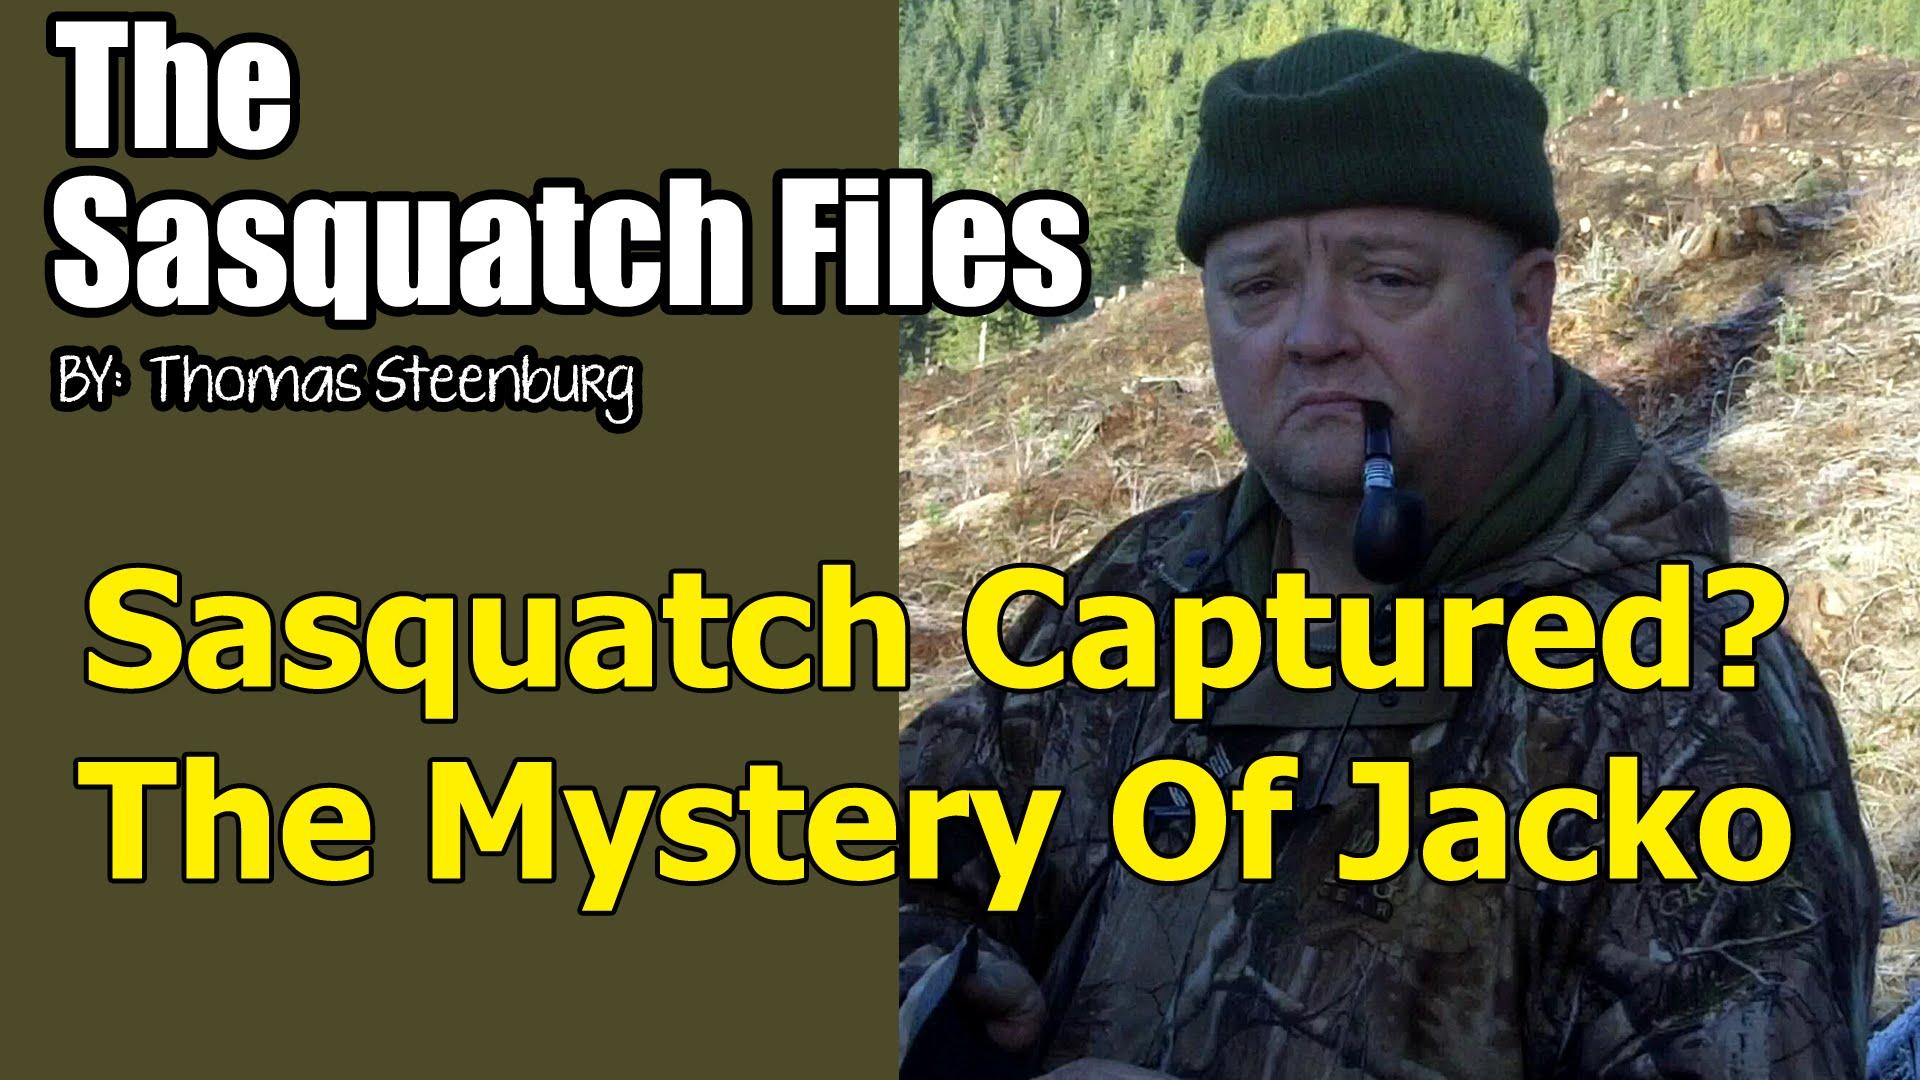 tsf-sasquatch-captured-the-myste